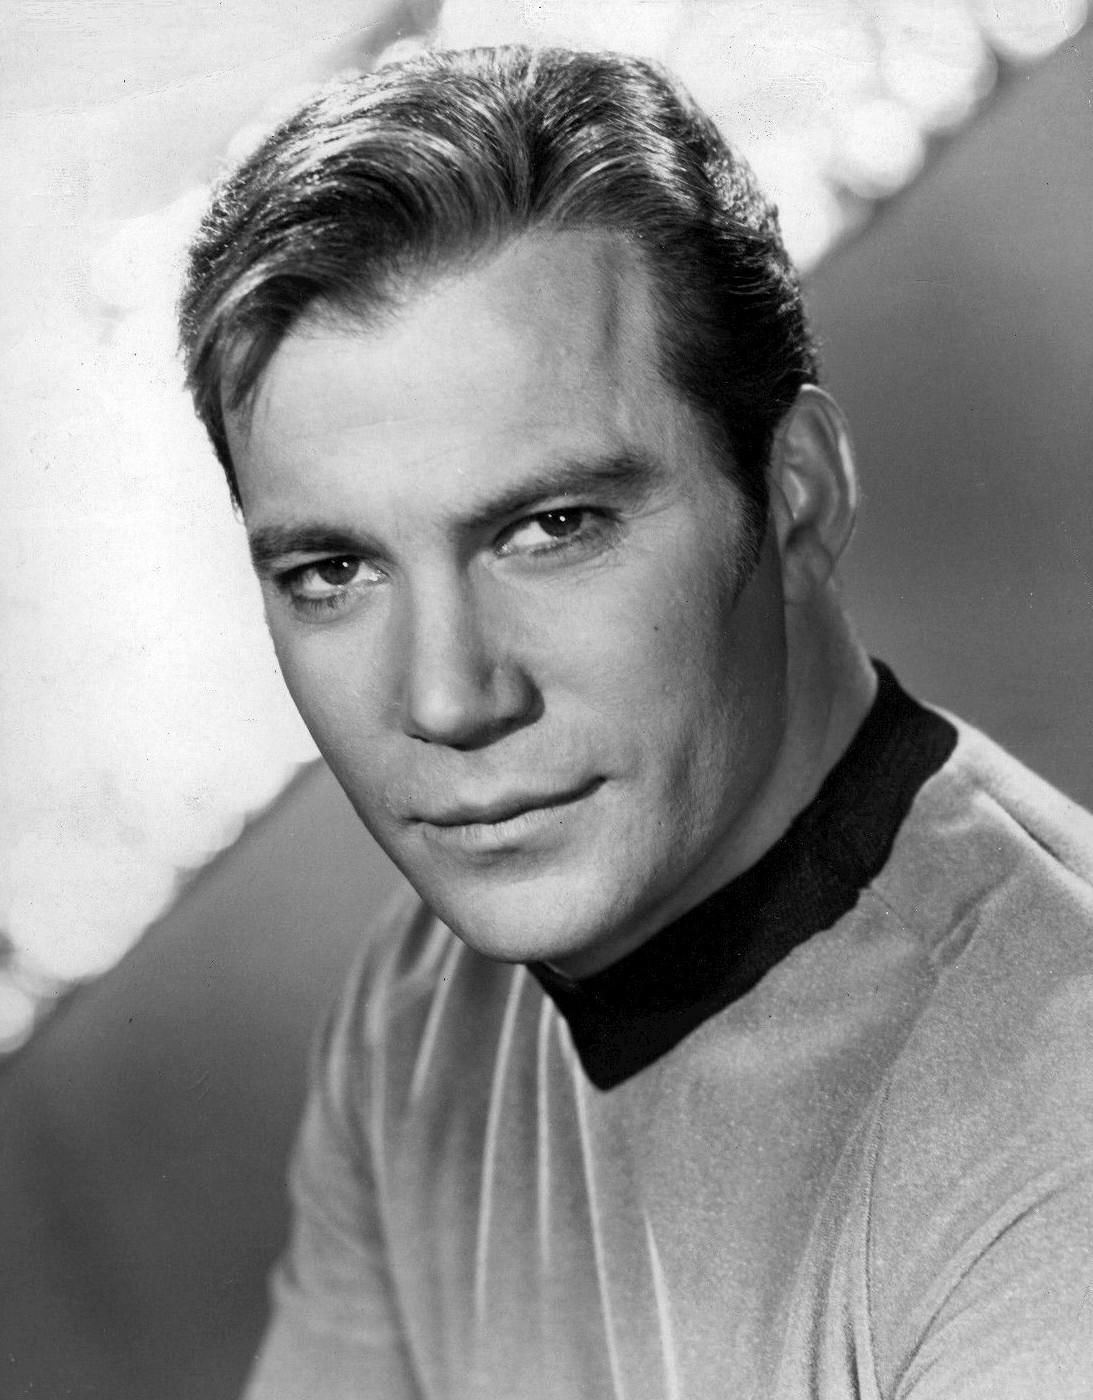 Publicity photo of William Shatner as Captain ...